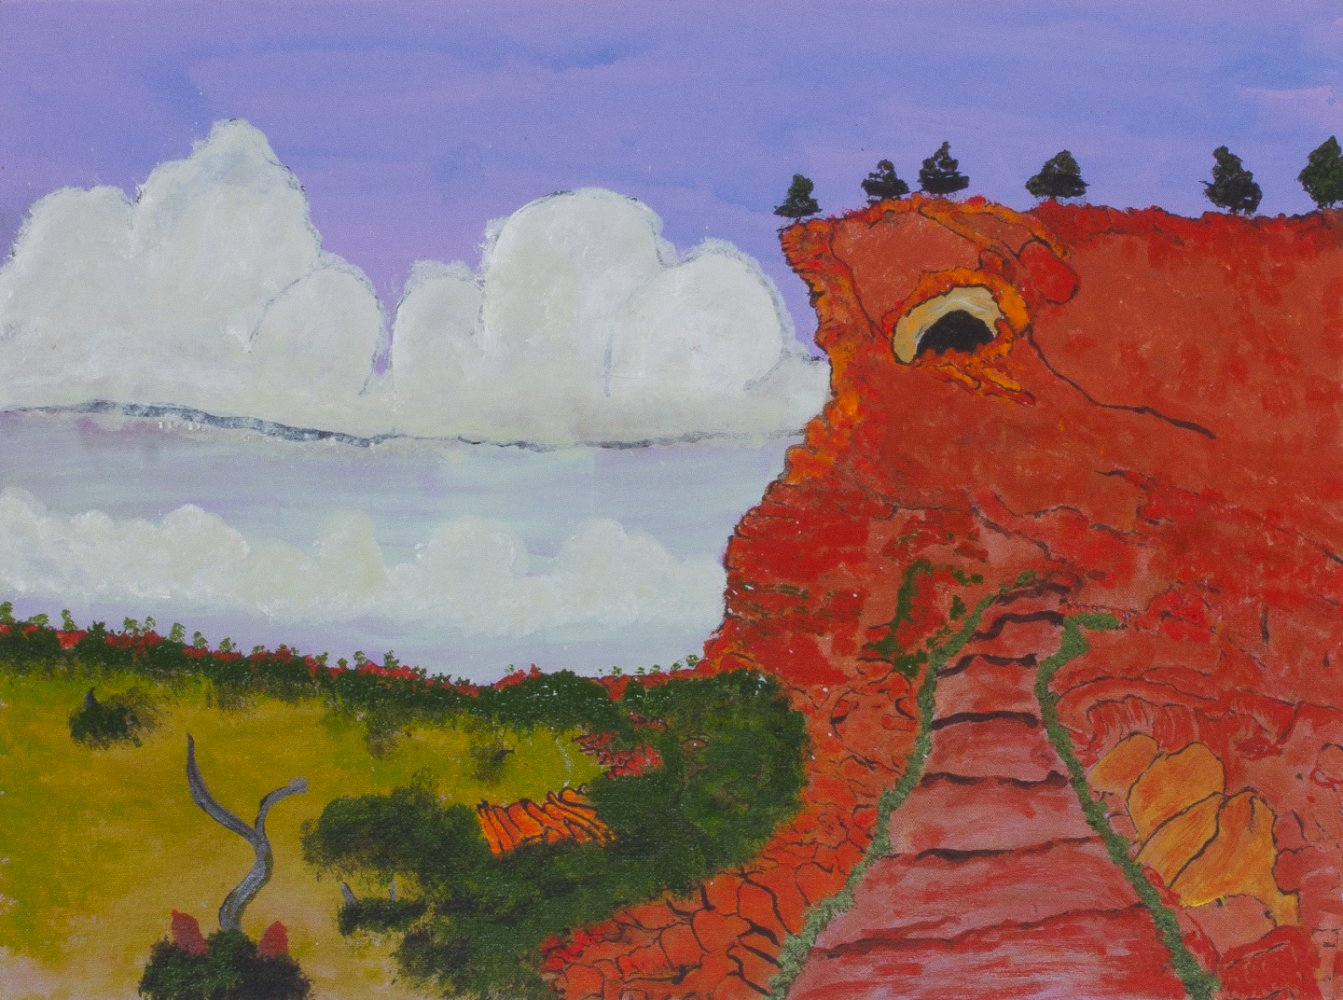 Victor Burton, Ngakgunalikujarra, acrylic Aboriginal landscape painting, 45.5x61cm